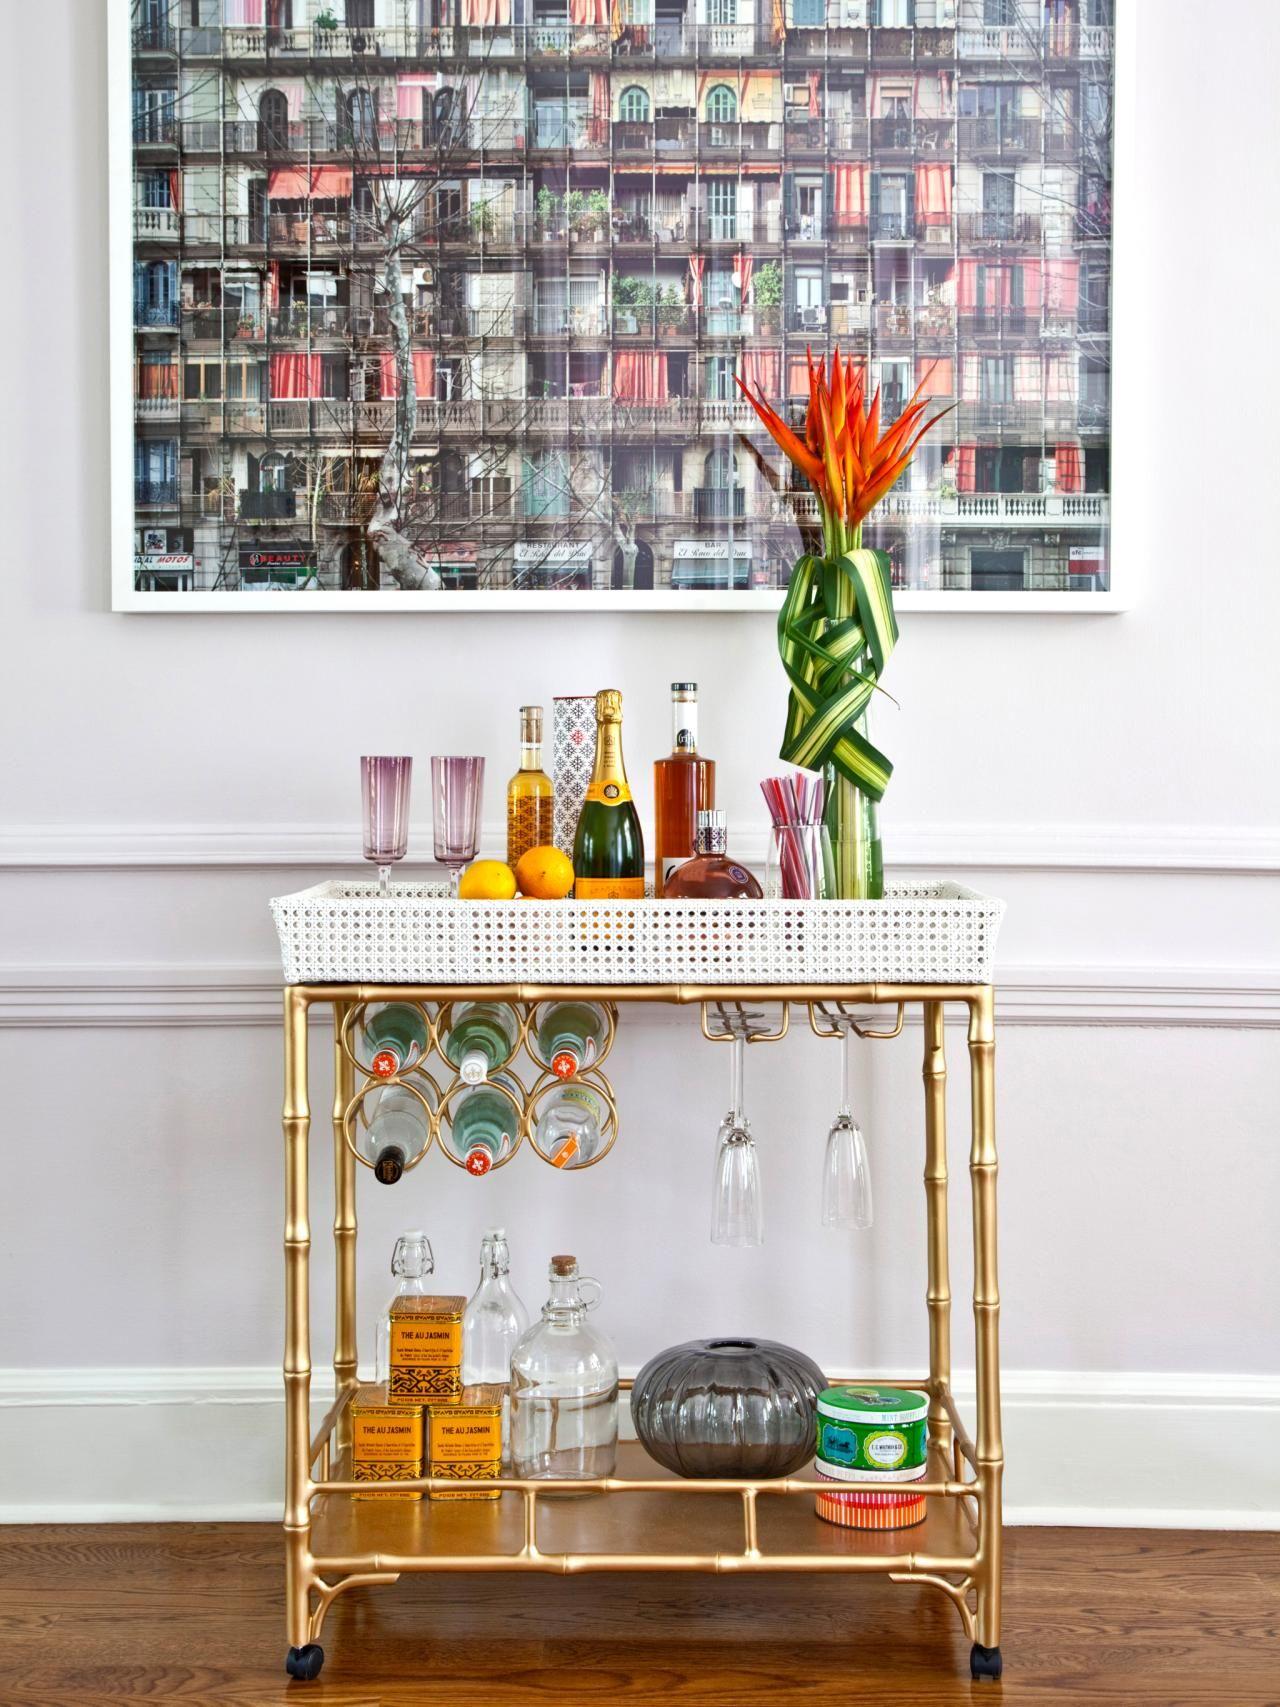 bar cart - Buscar con Google | Living room | Pinterest | Bar, Buscar ...